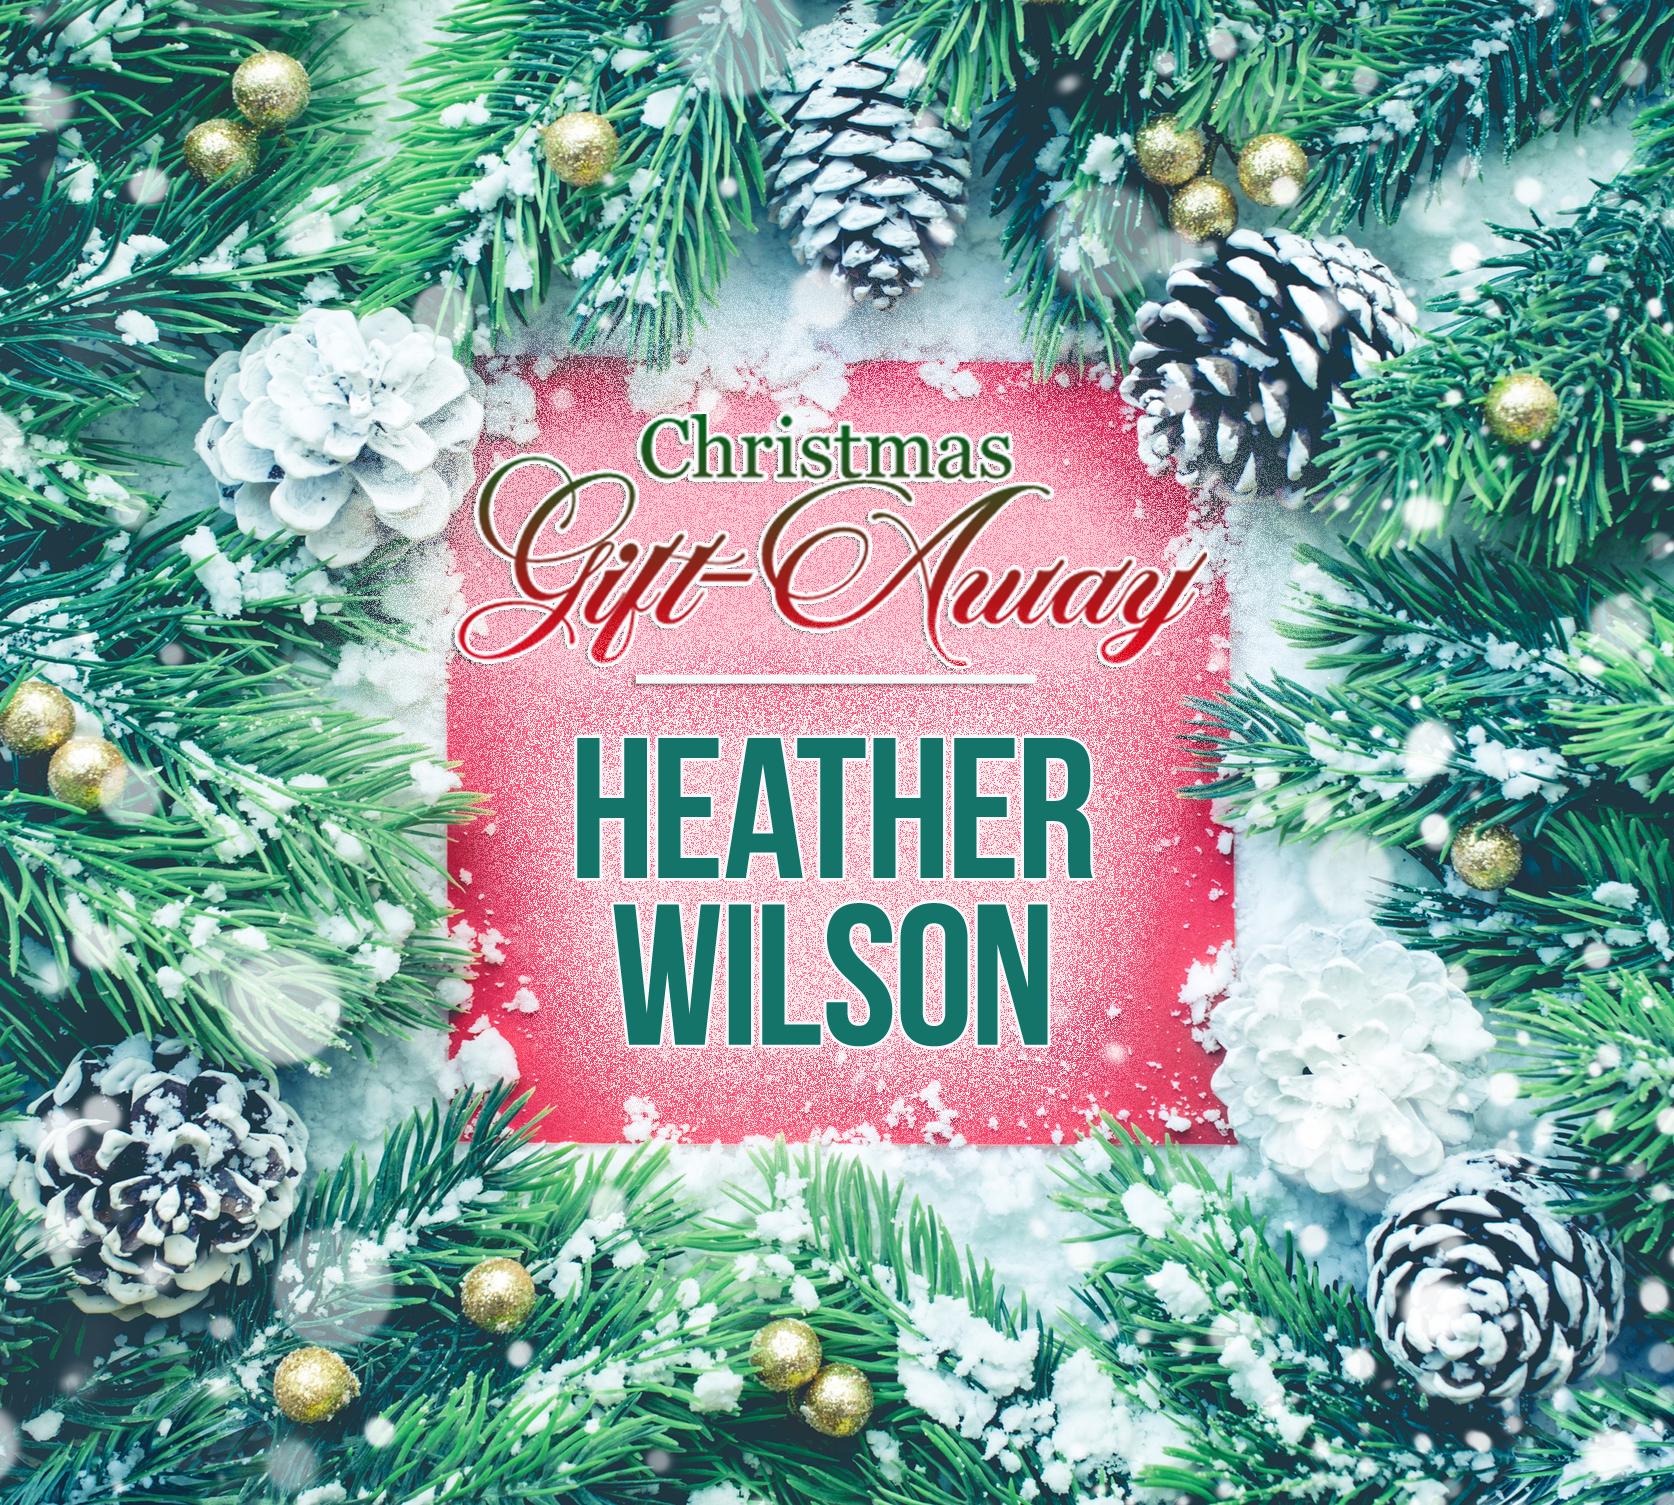 Christmas Gift Away Recipient #5: Heather Wilson